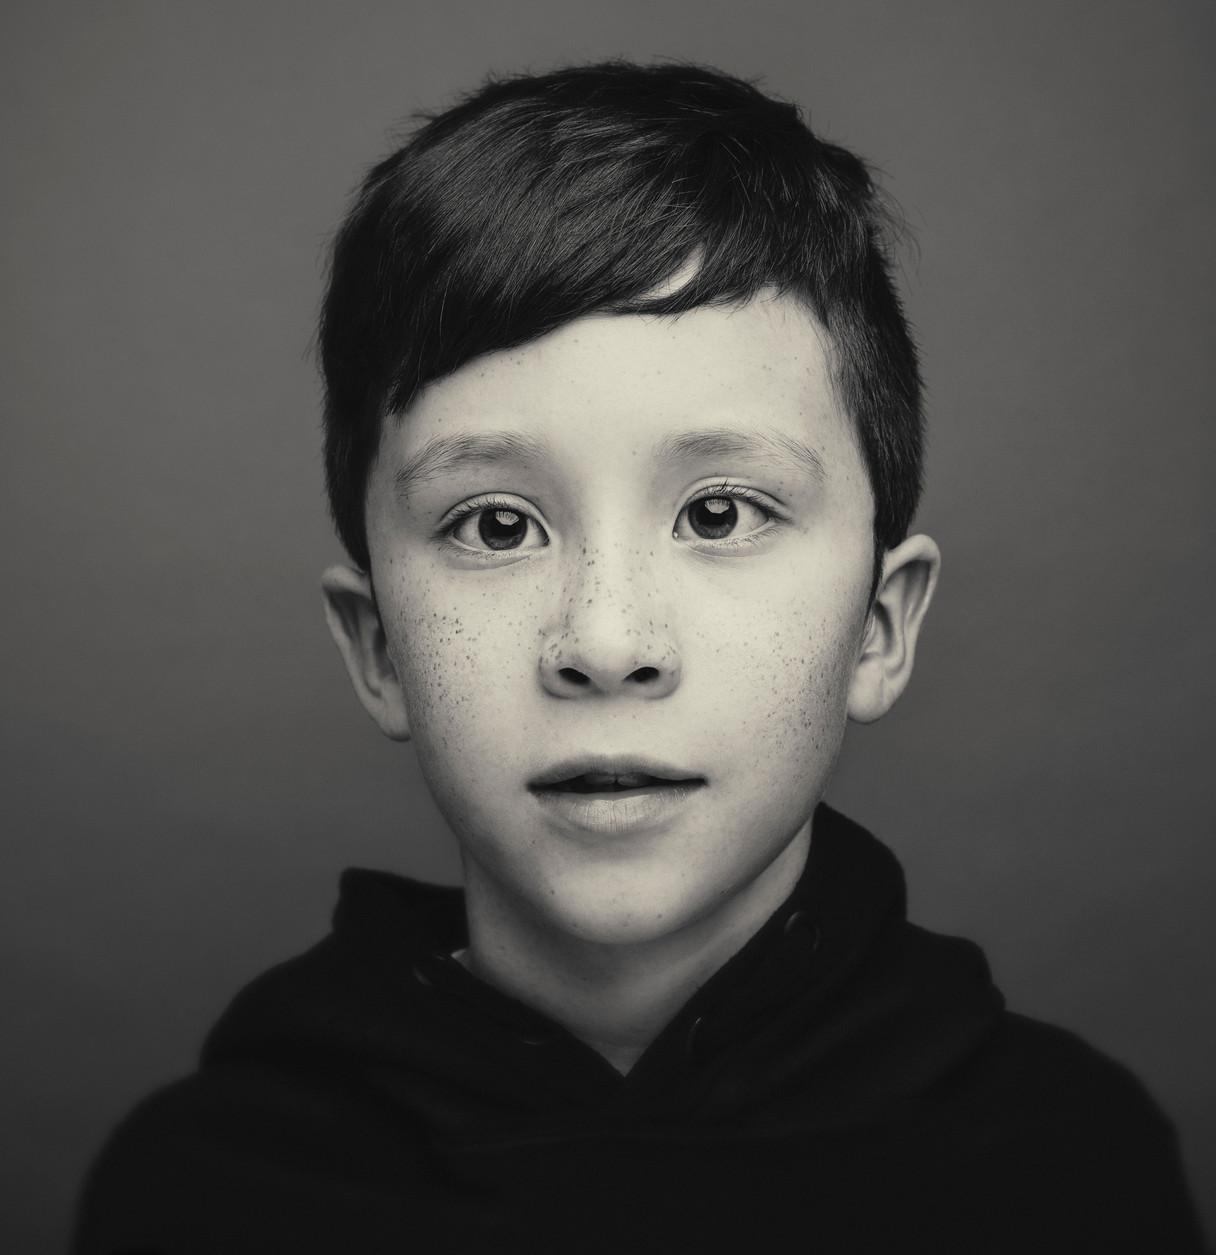 Levente Portrait Photography Berlin 10